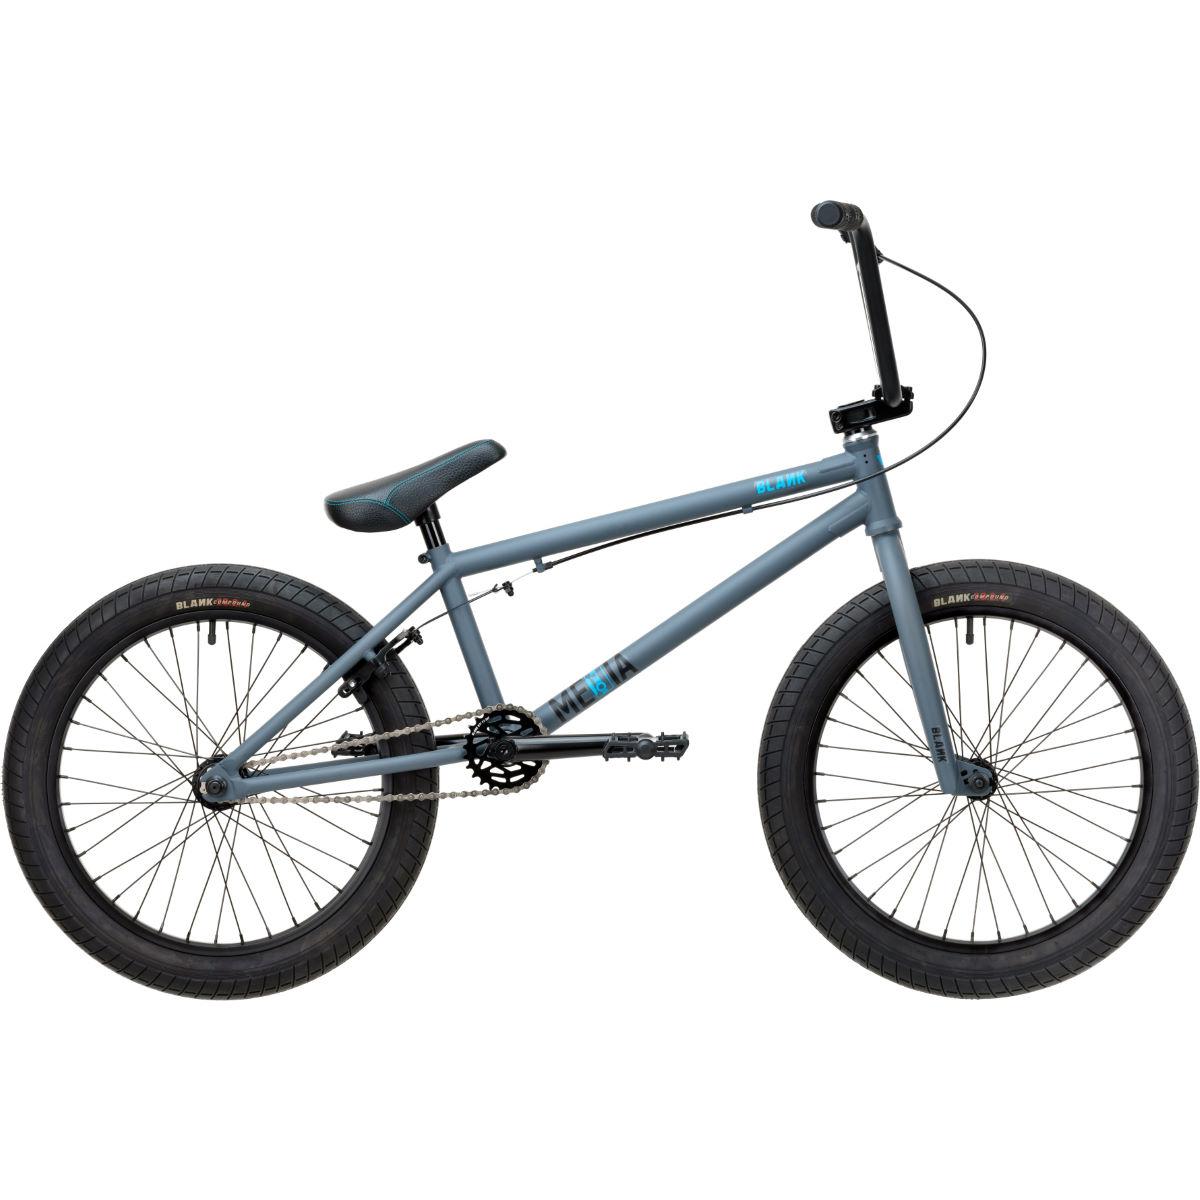 Blank Media 20 20 Charcoal Freestyle Bikes